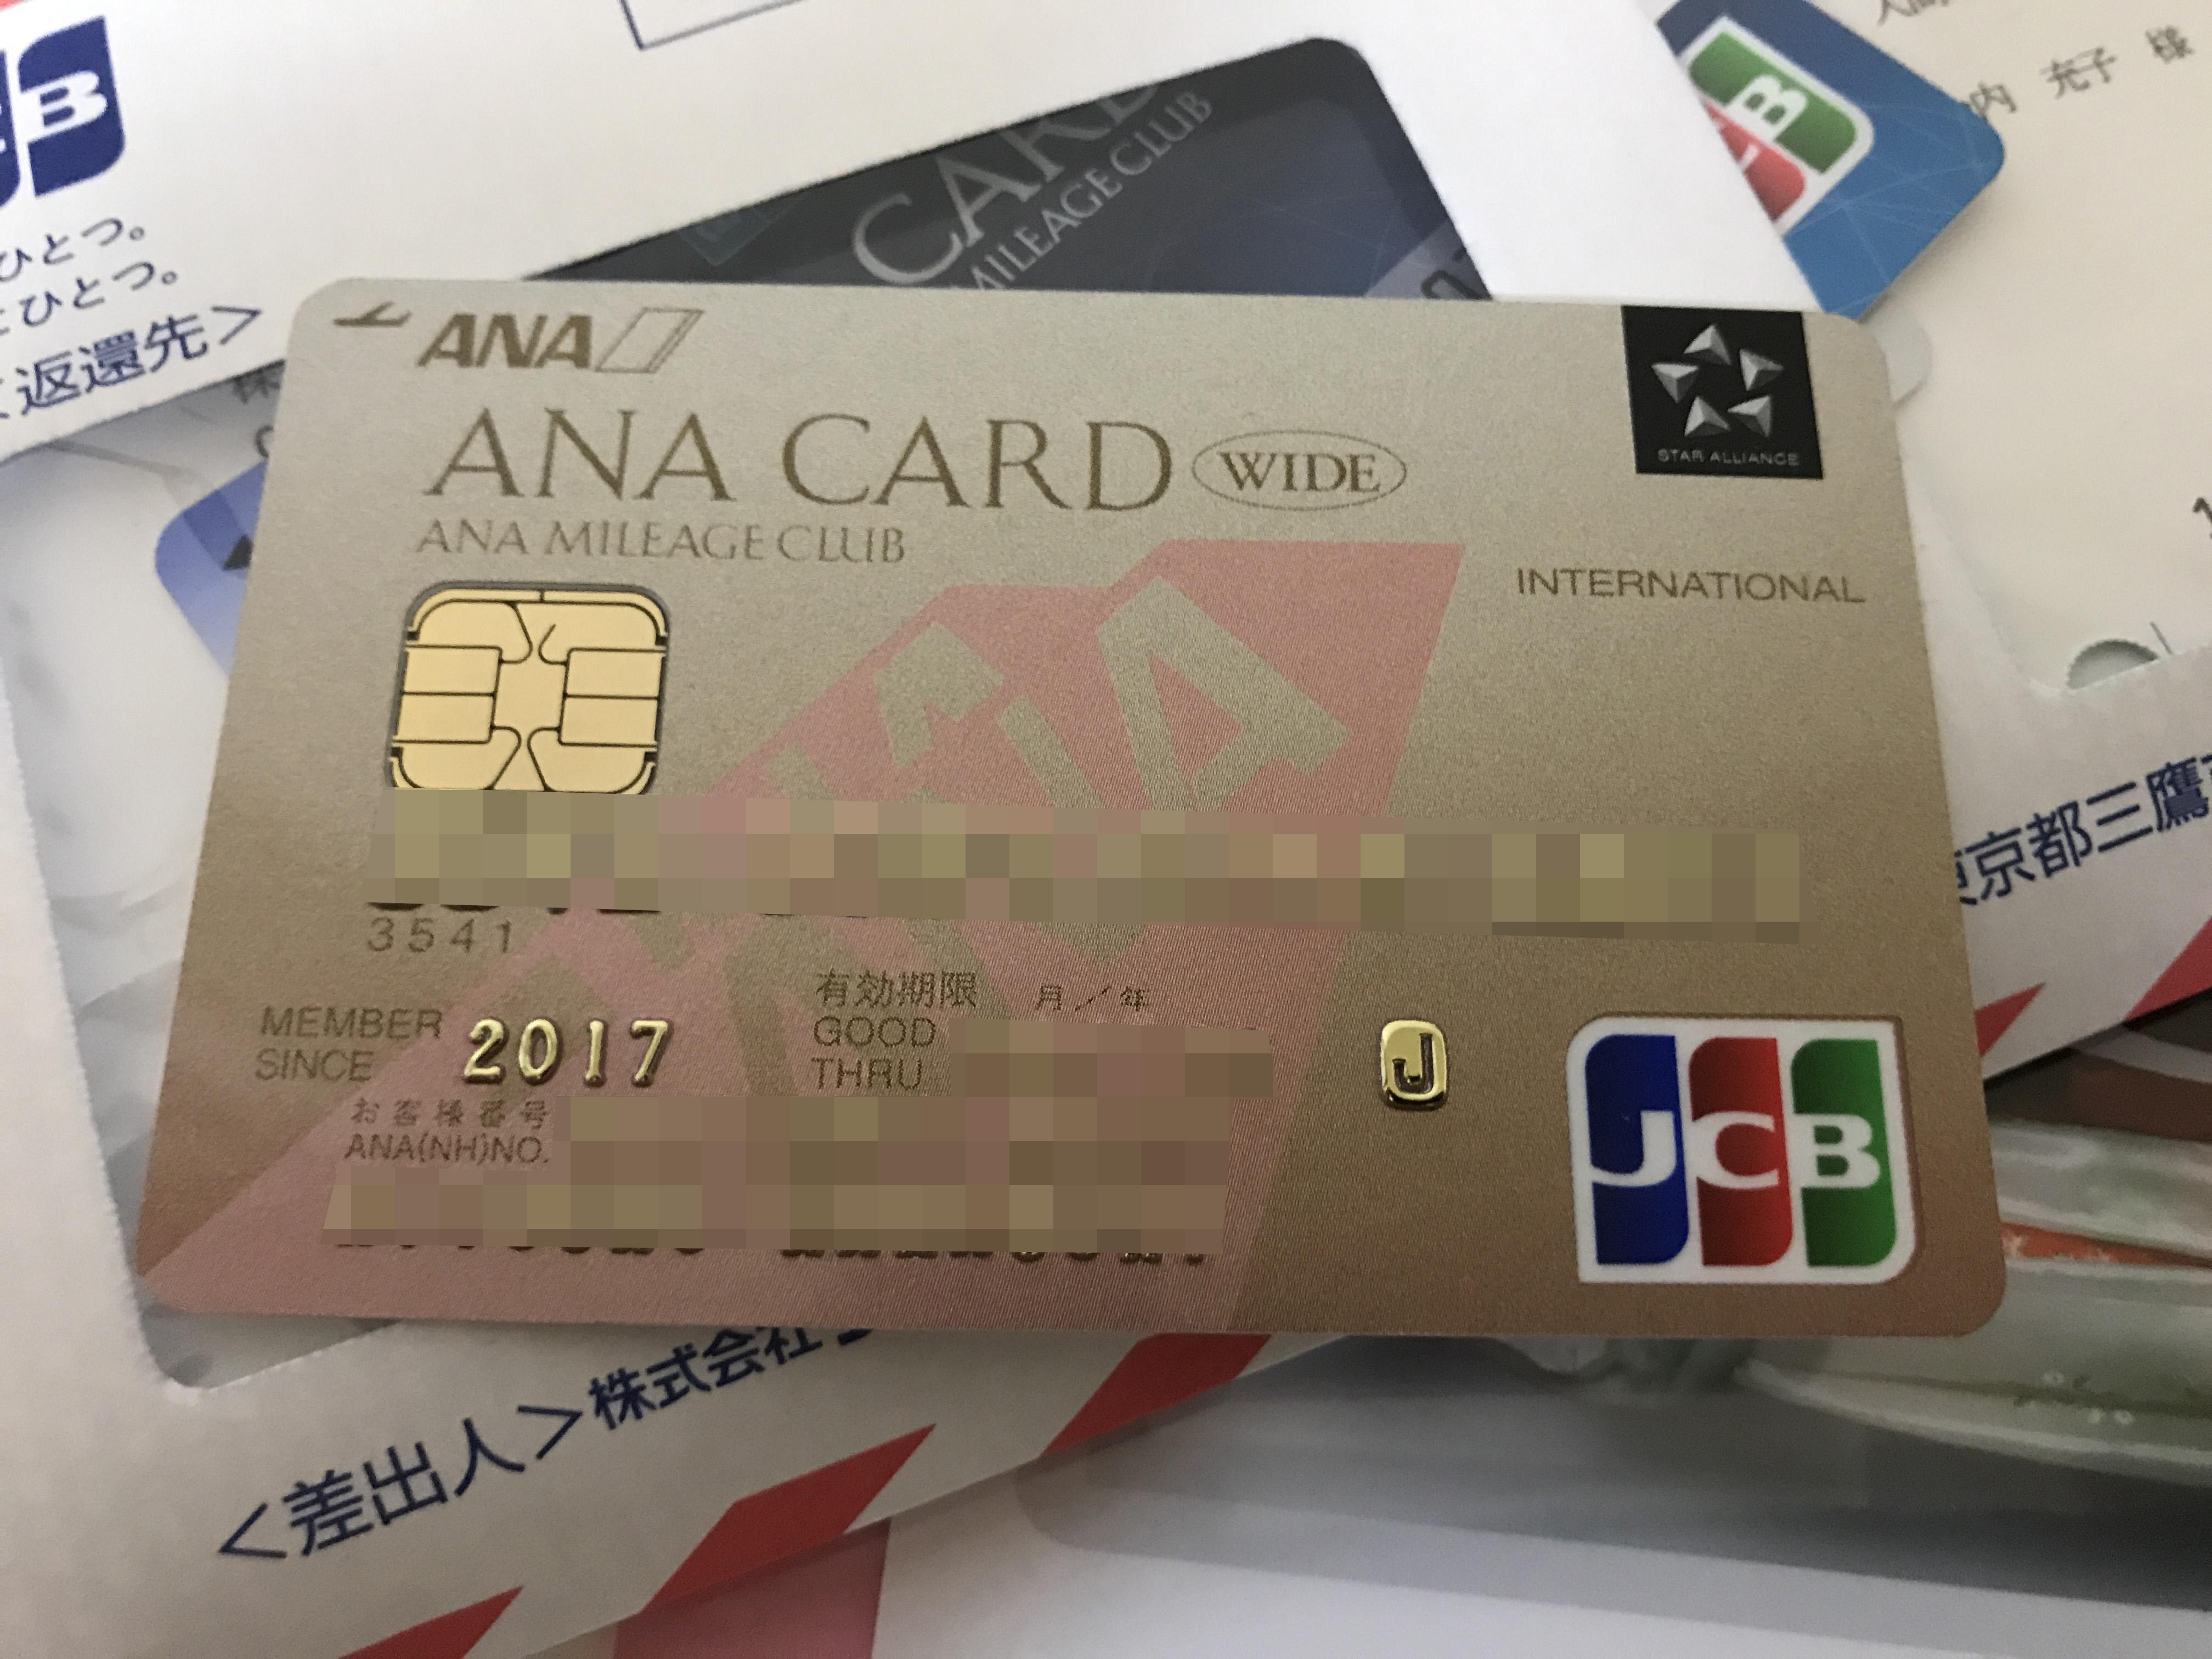 ANA JCBゴールドカード 限定デザイン(朝空色)